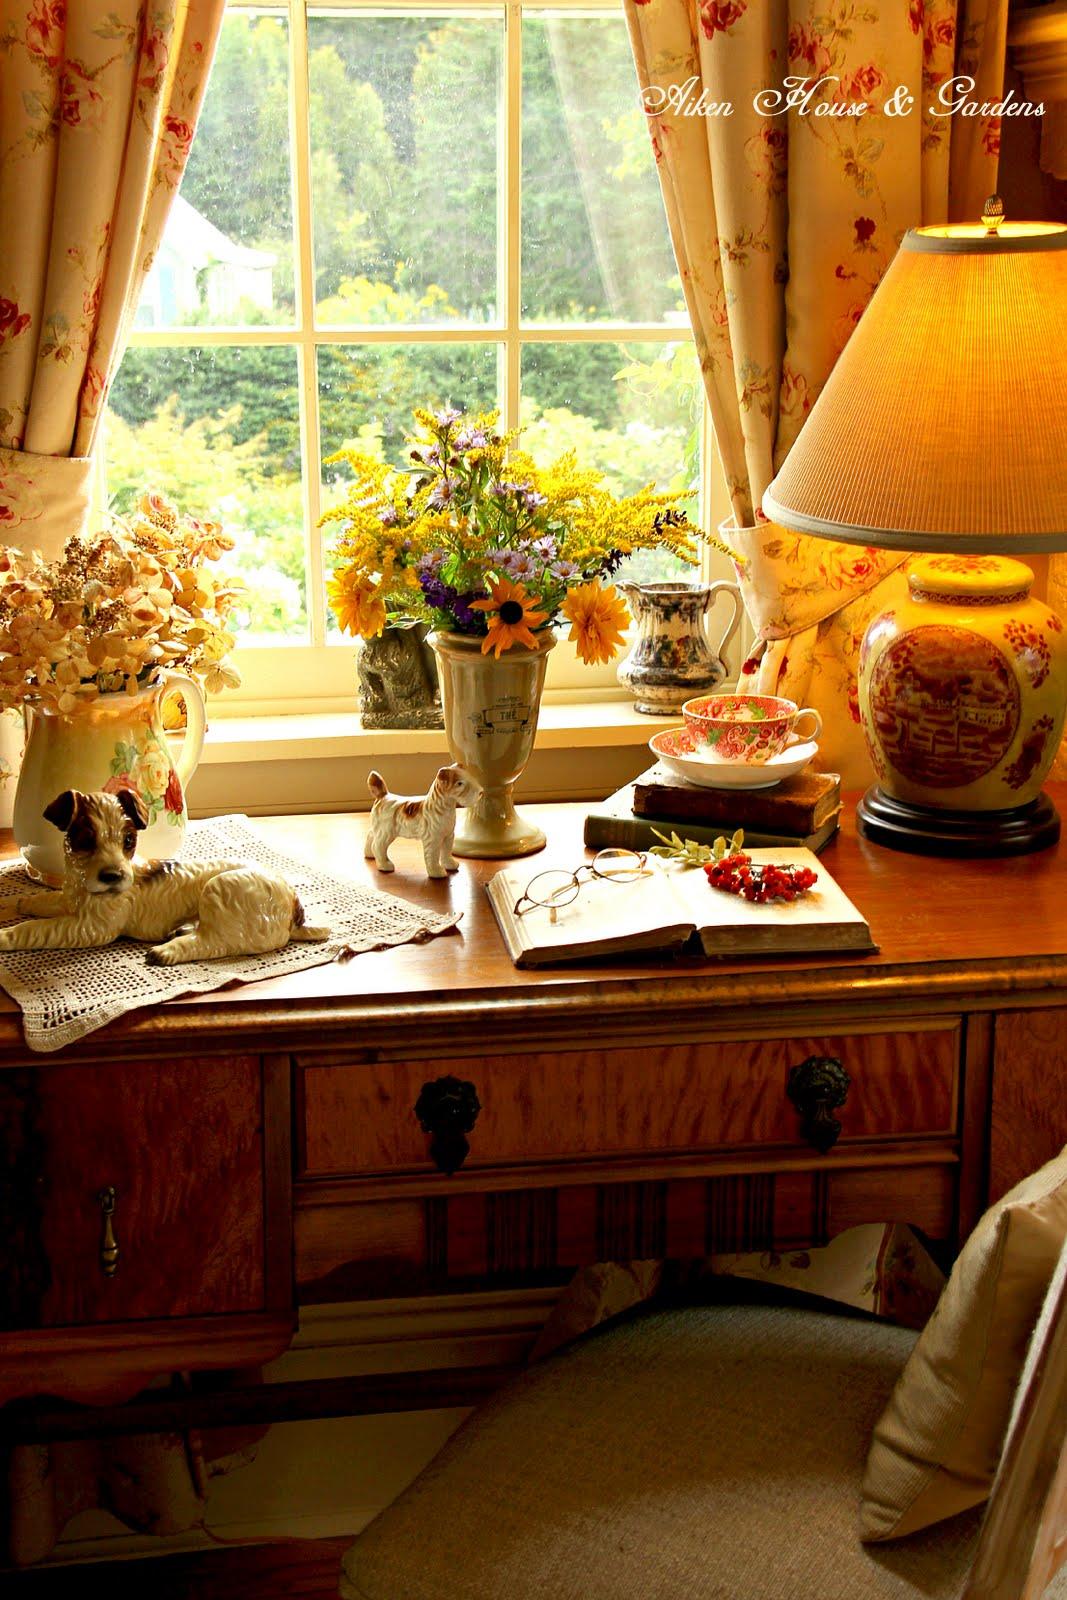 Aiken House & Gardens: Autumn Light in our Library